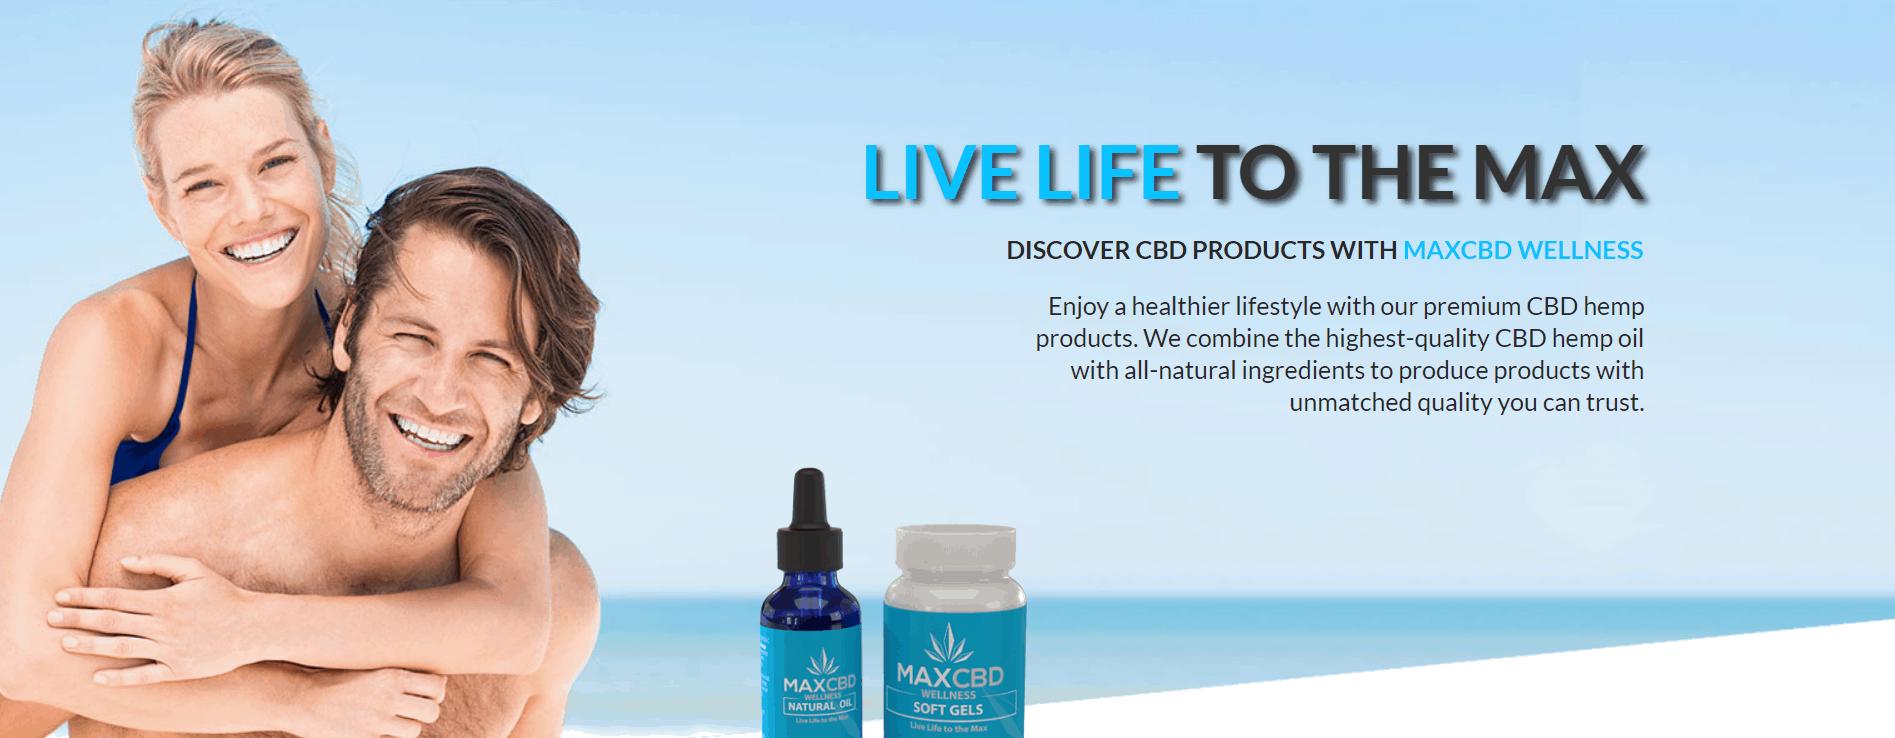 MaxCBD Wellness Coupons Healthier Lifestyle